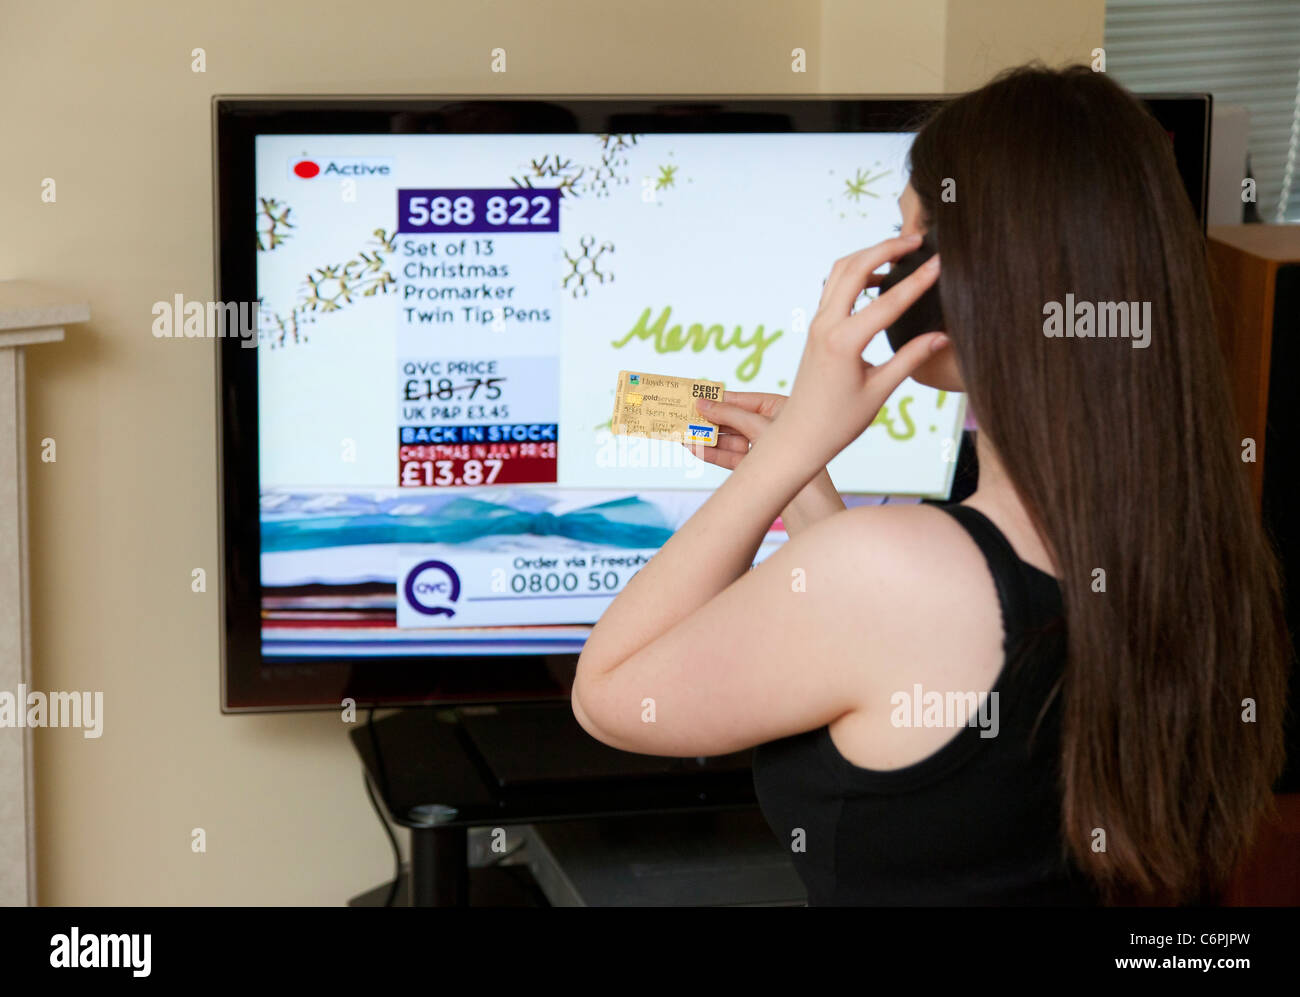 tv qvc. stock photo - woman buying from qvc shopping tv channel tv qvc